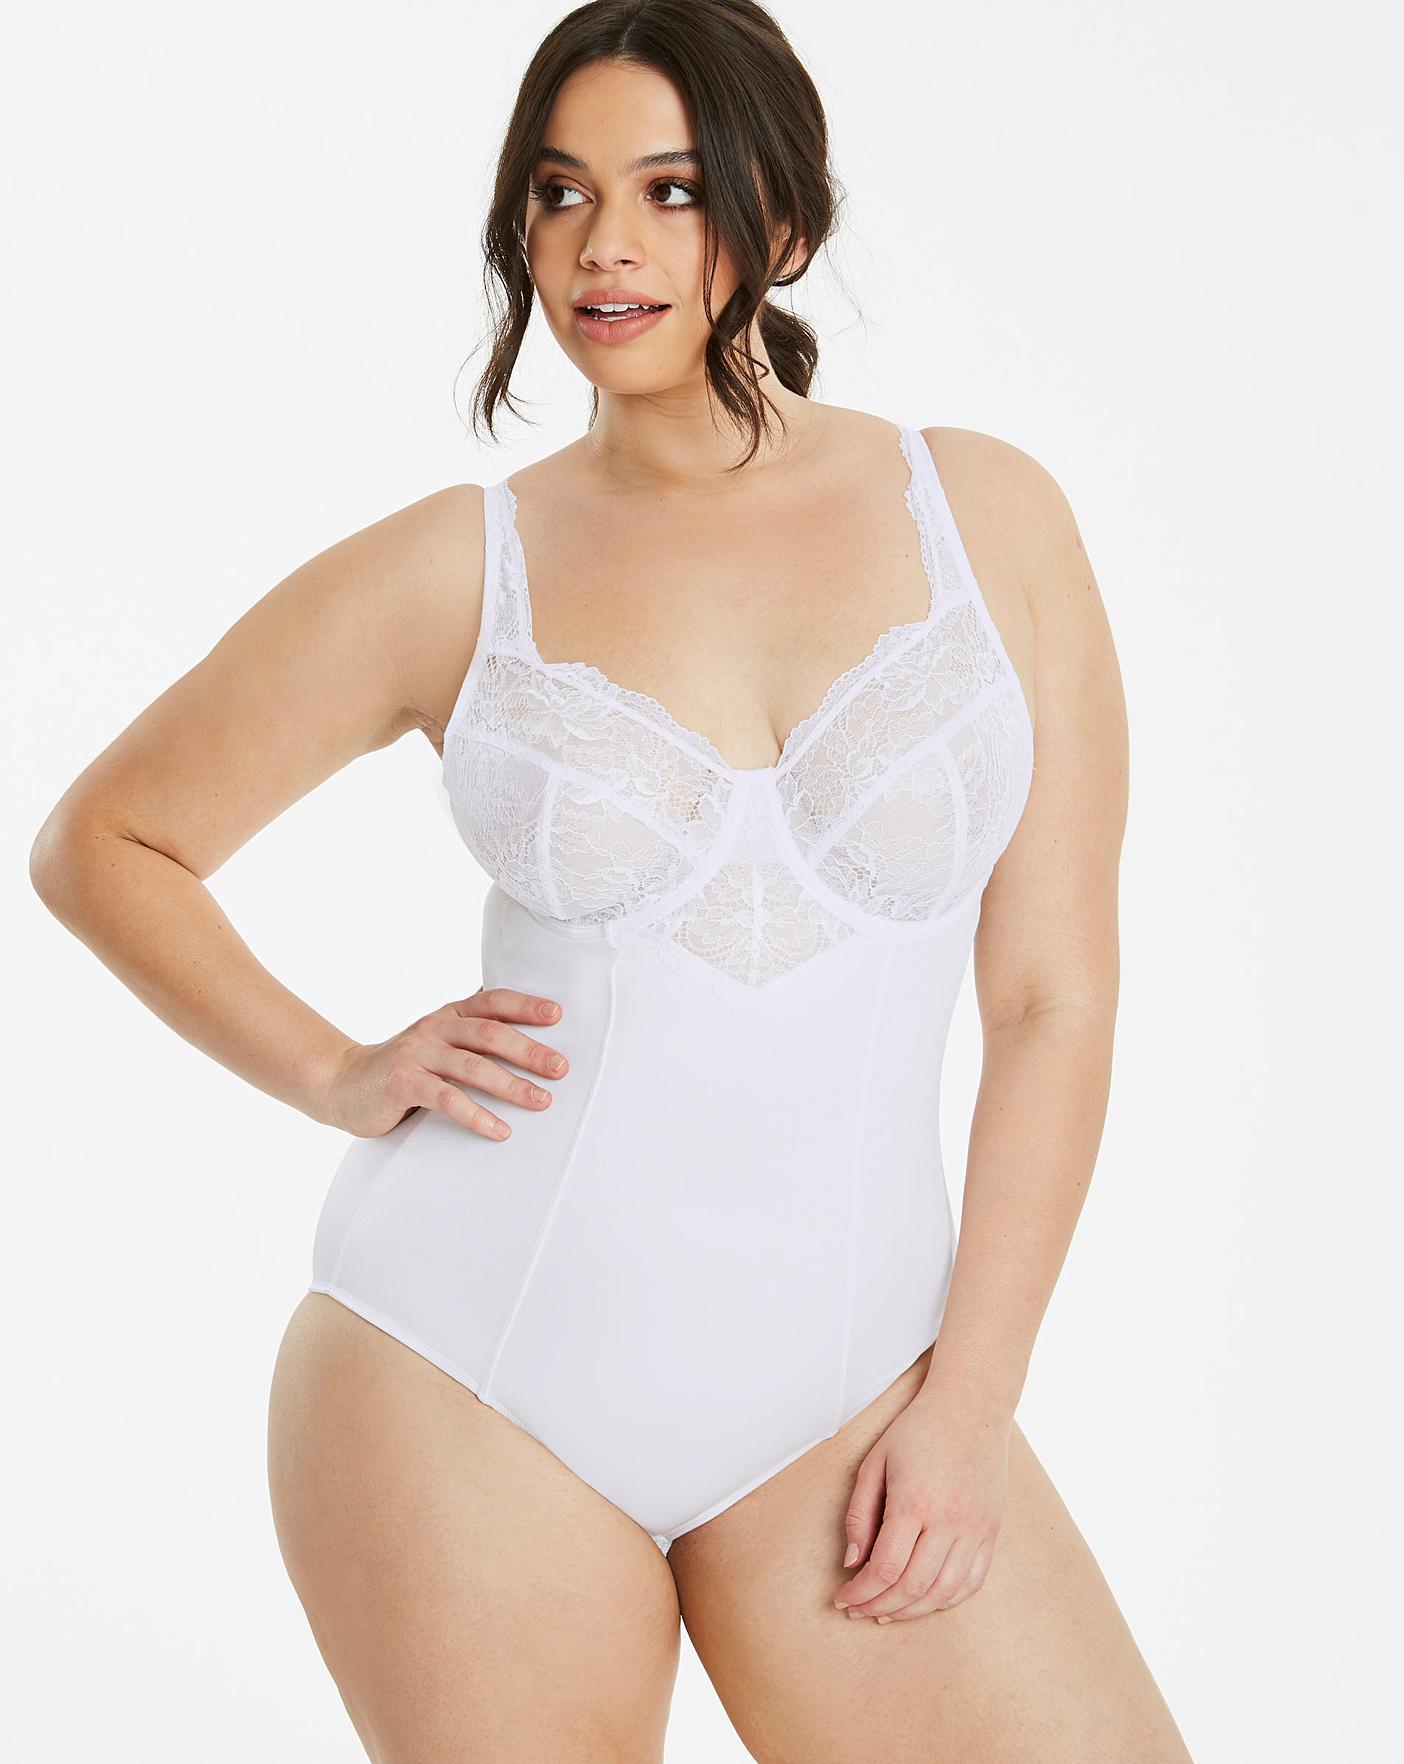 a08657a9d3 Ella Lace Firm Control White Bodyshaper